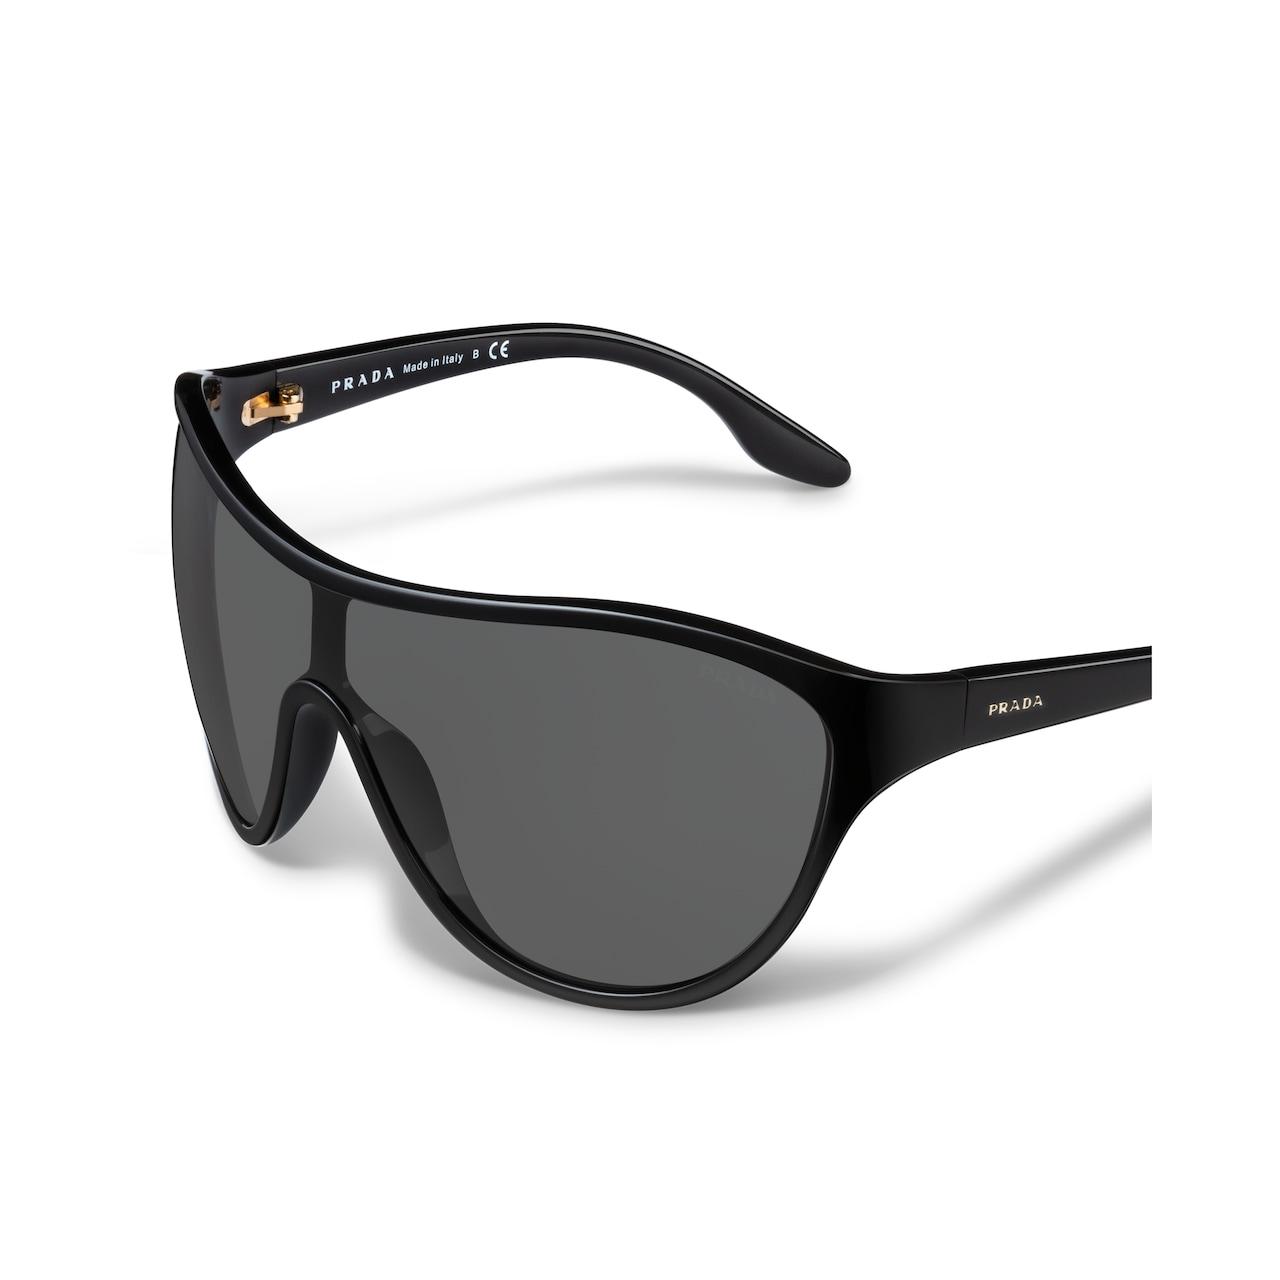 Prada Prada Eyewear Collection sunglasses 5